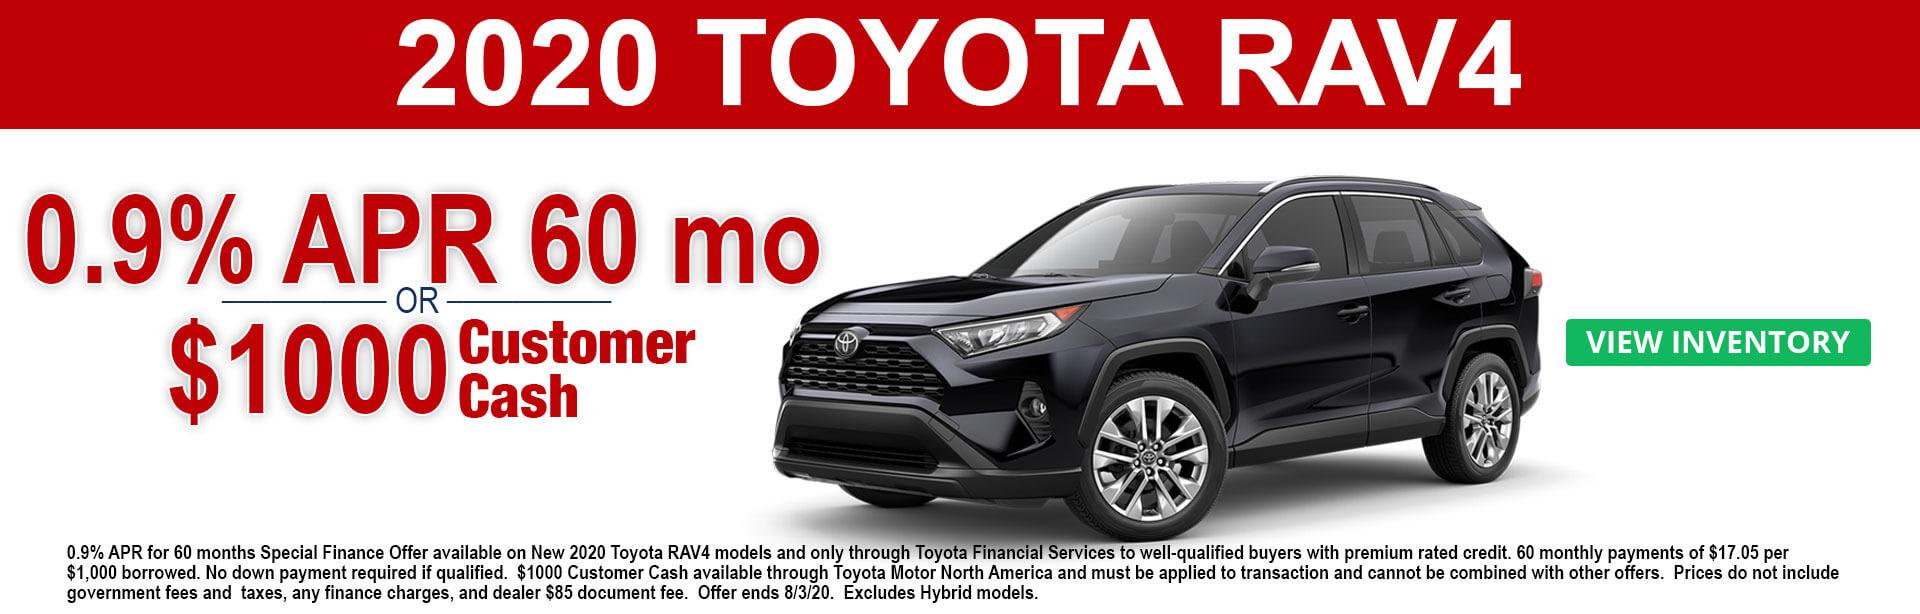 2020 Toyota RAV4 APR and Cash Offer